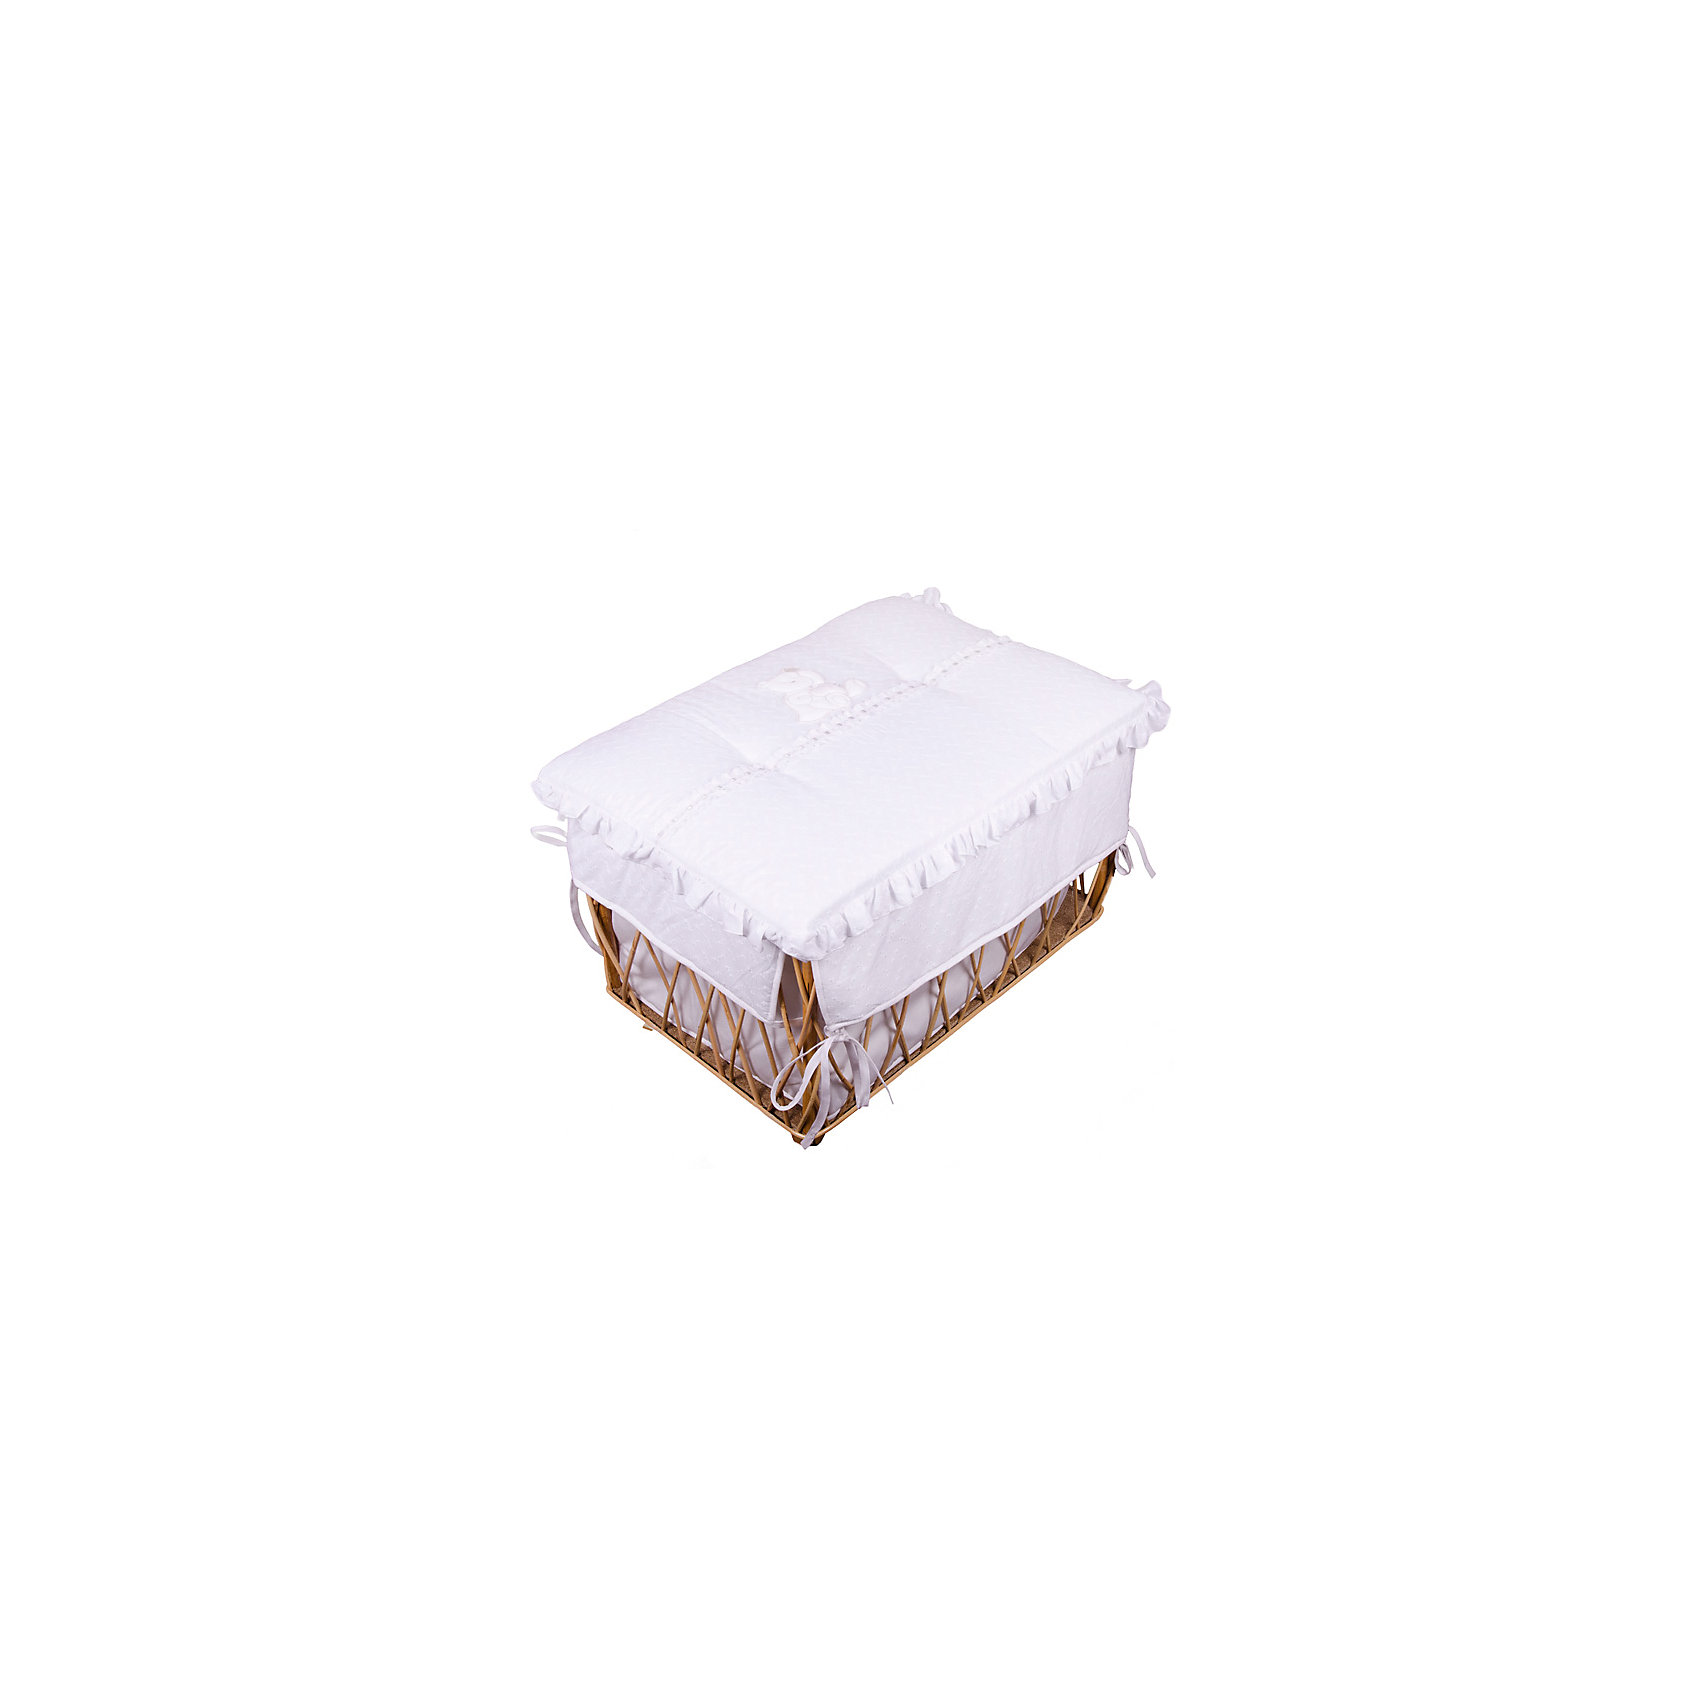 Italbaby Плетеный ящик для игрушек AMORE,Italbaby, белый ящик italbaby плетеный ящик для игрушек sweet star крем